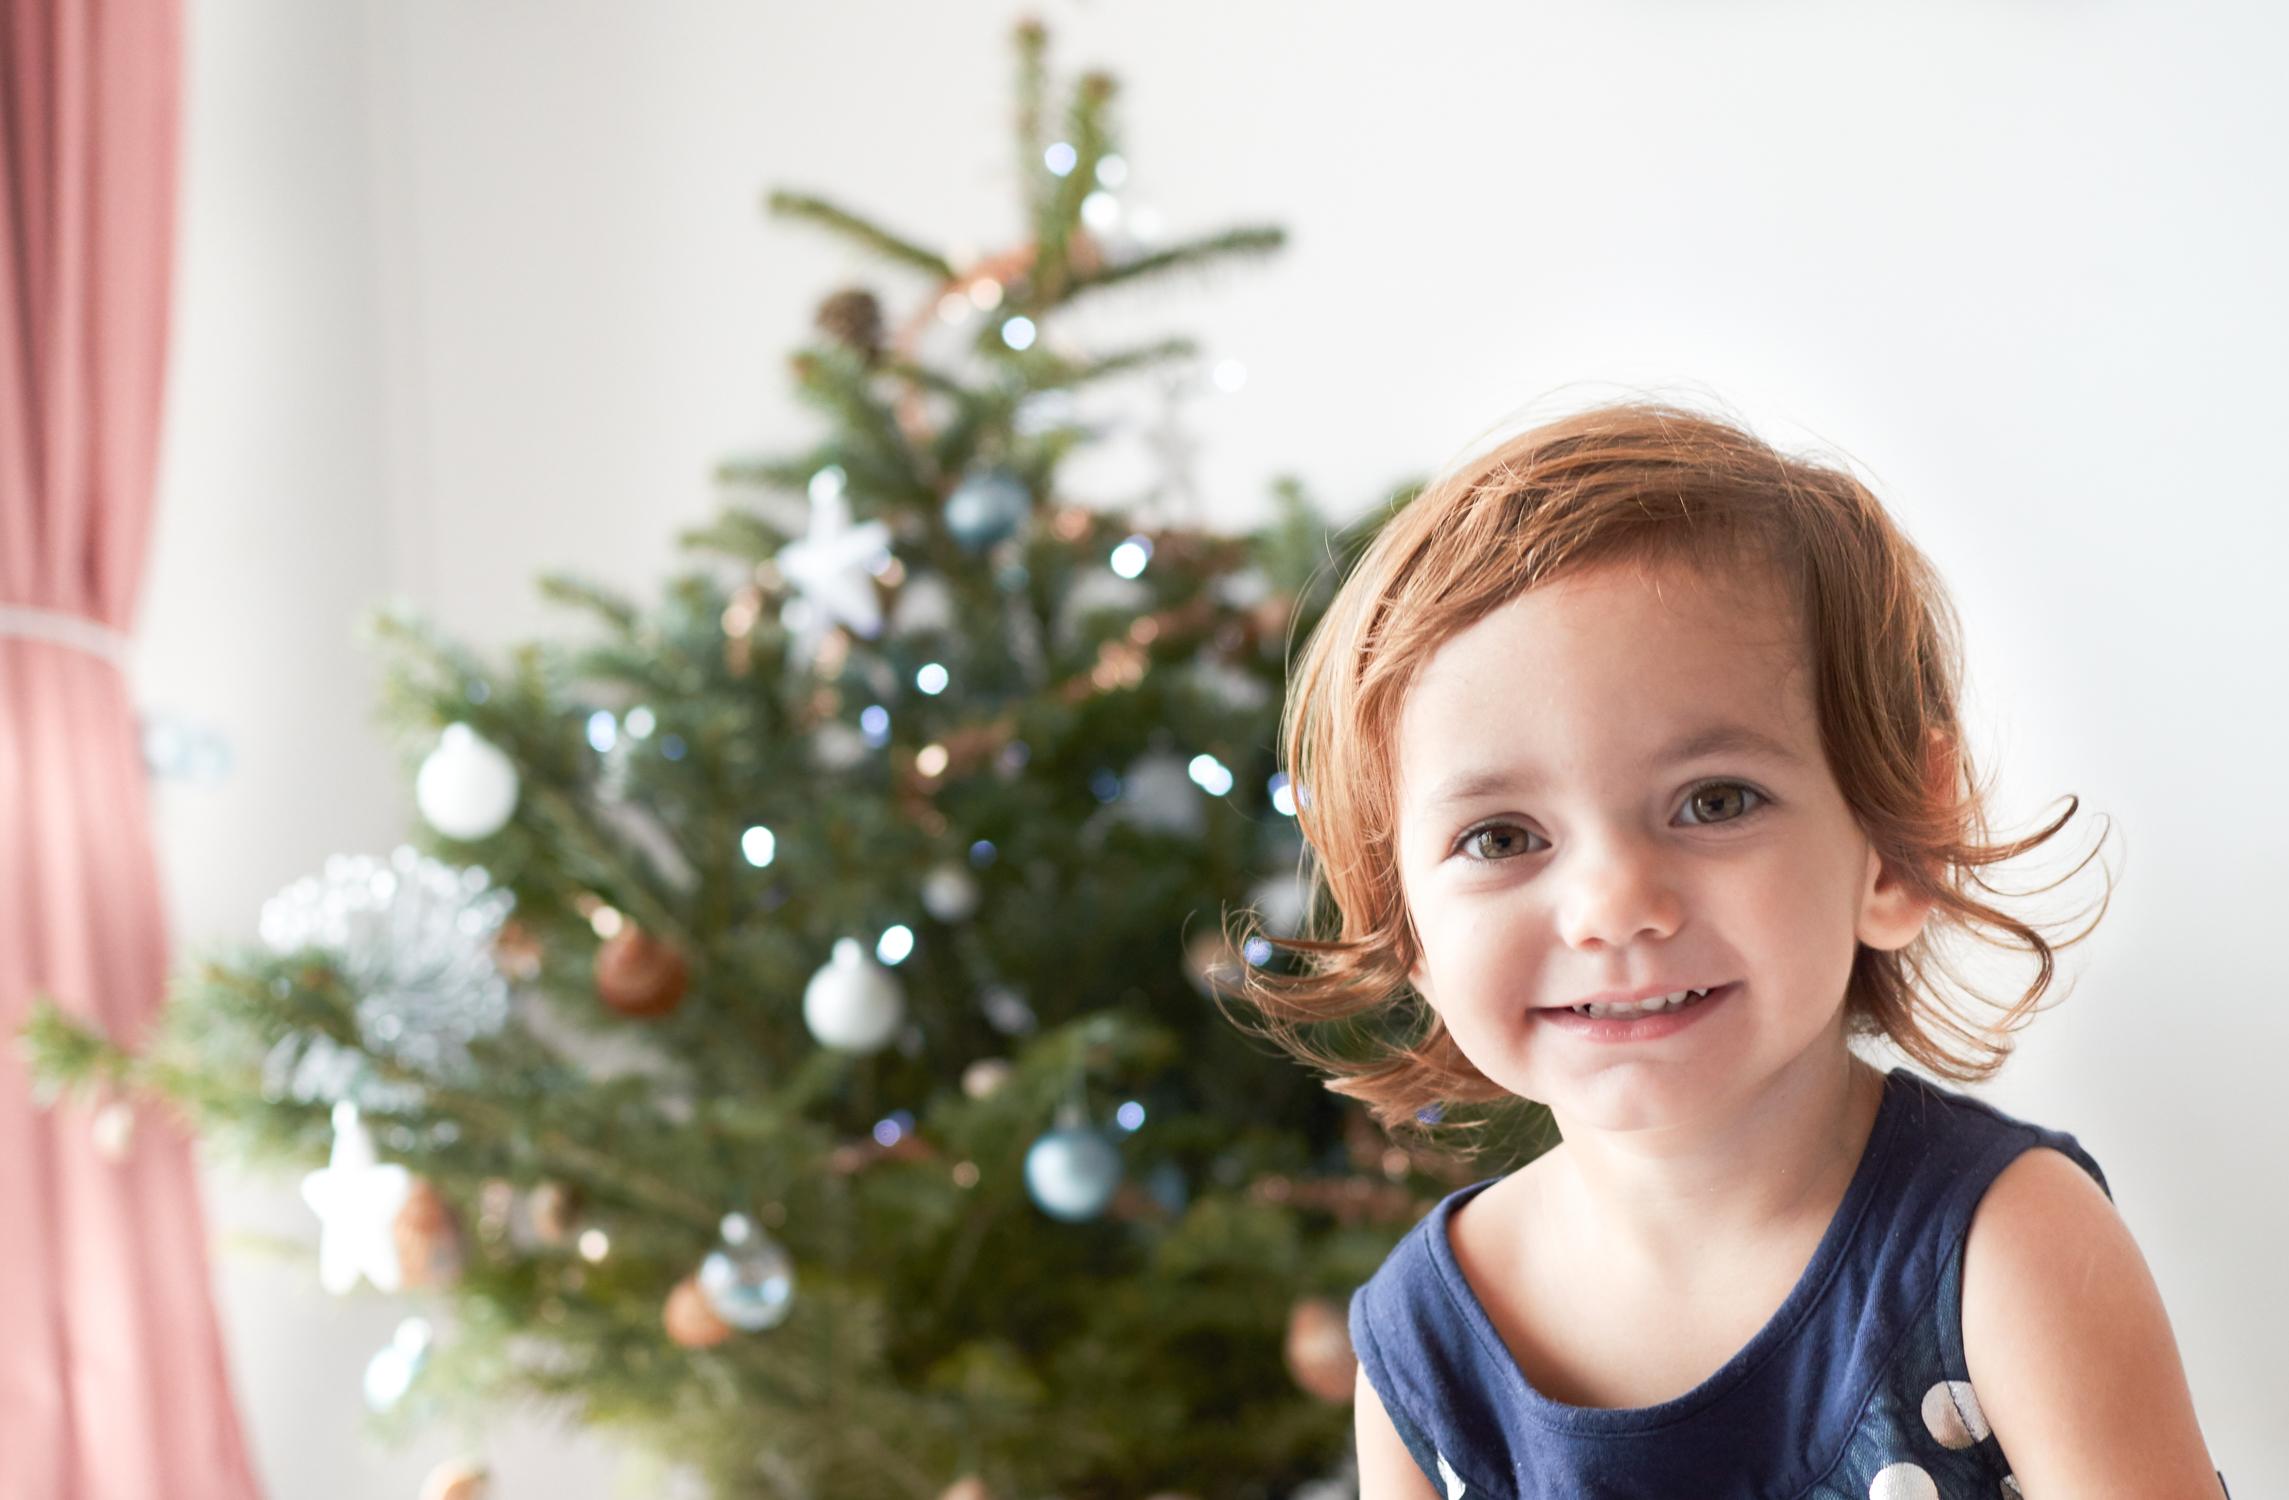 Child_photography_ideas-1-3